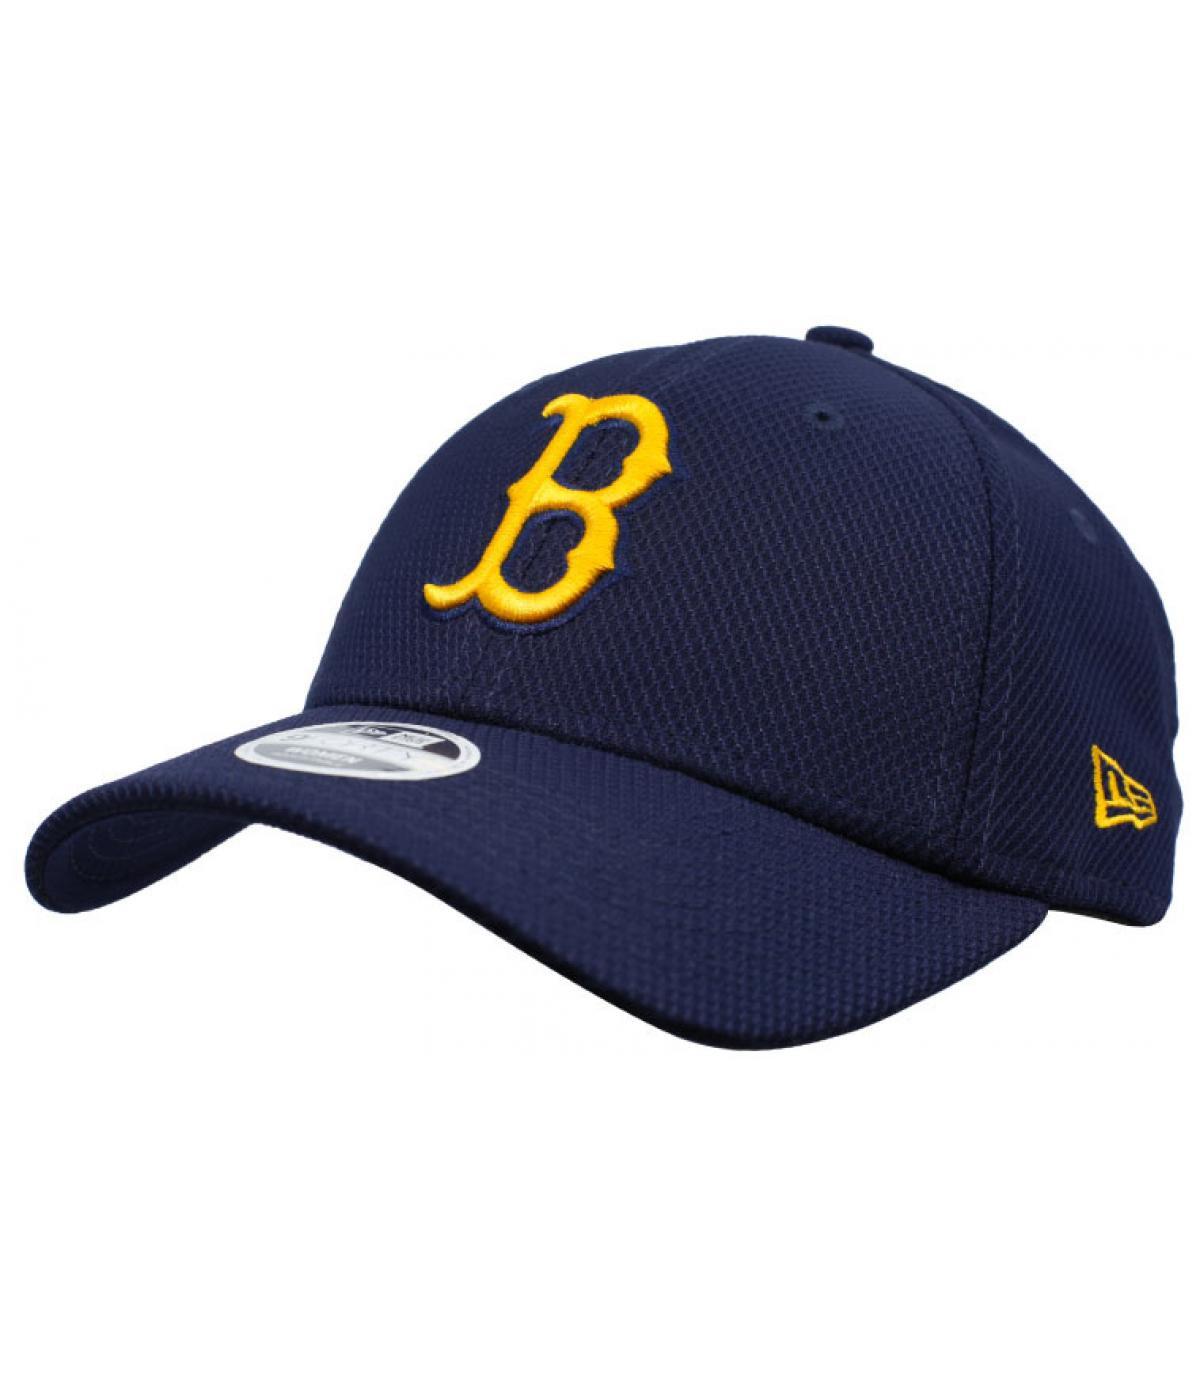 d85eb7d4a68 B women cap blue yellow - Wmns Diamond Era Boston 9Forty navy gold ...